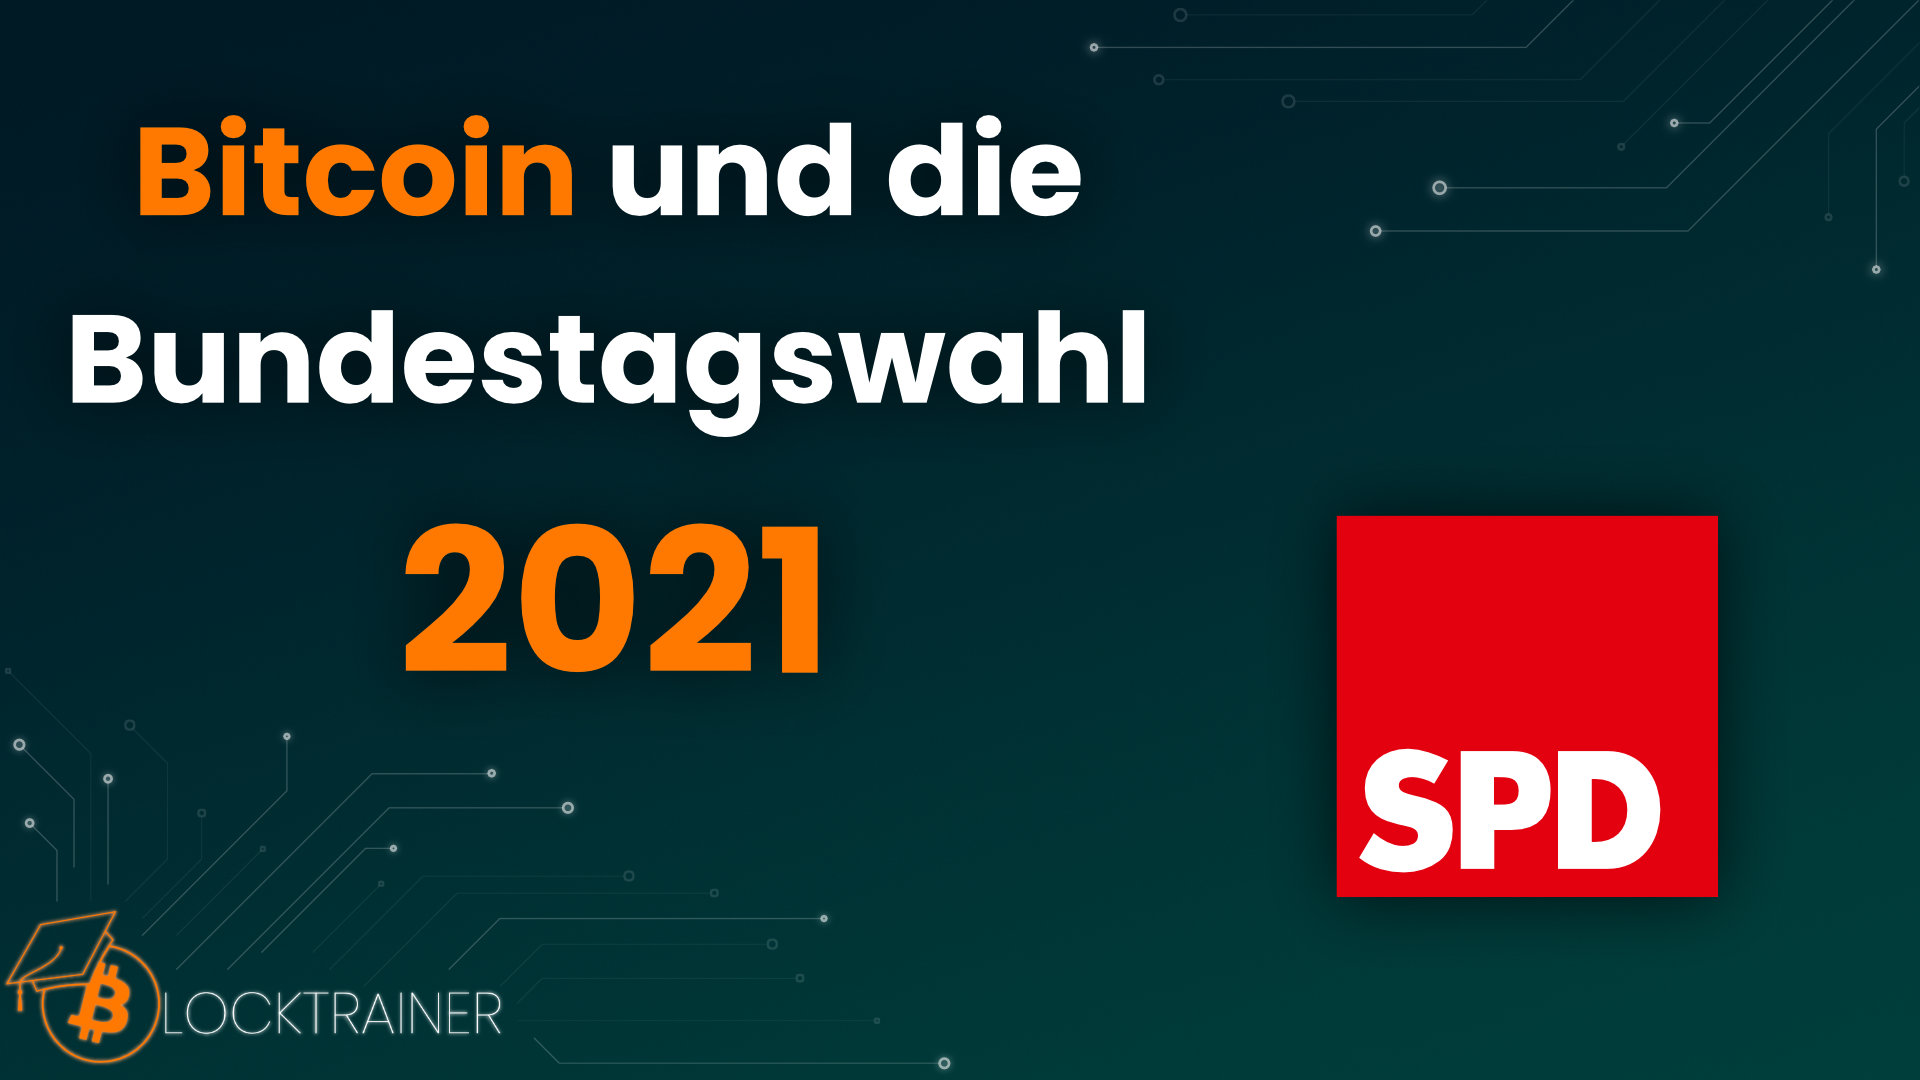 Bitcoin Bundestagswahl 2021 SPD